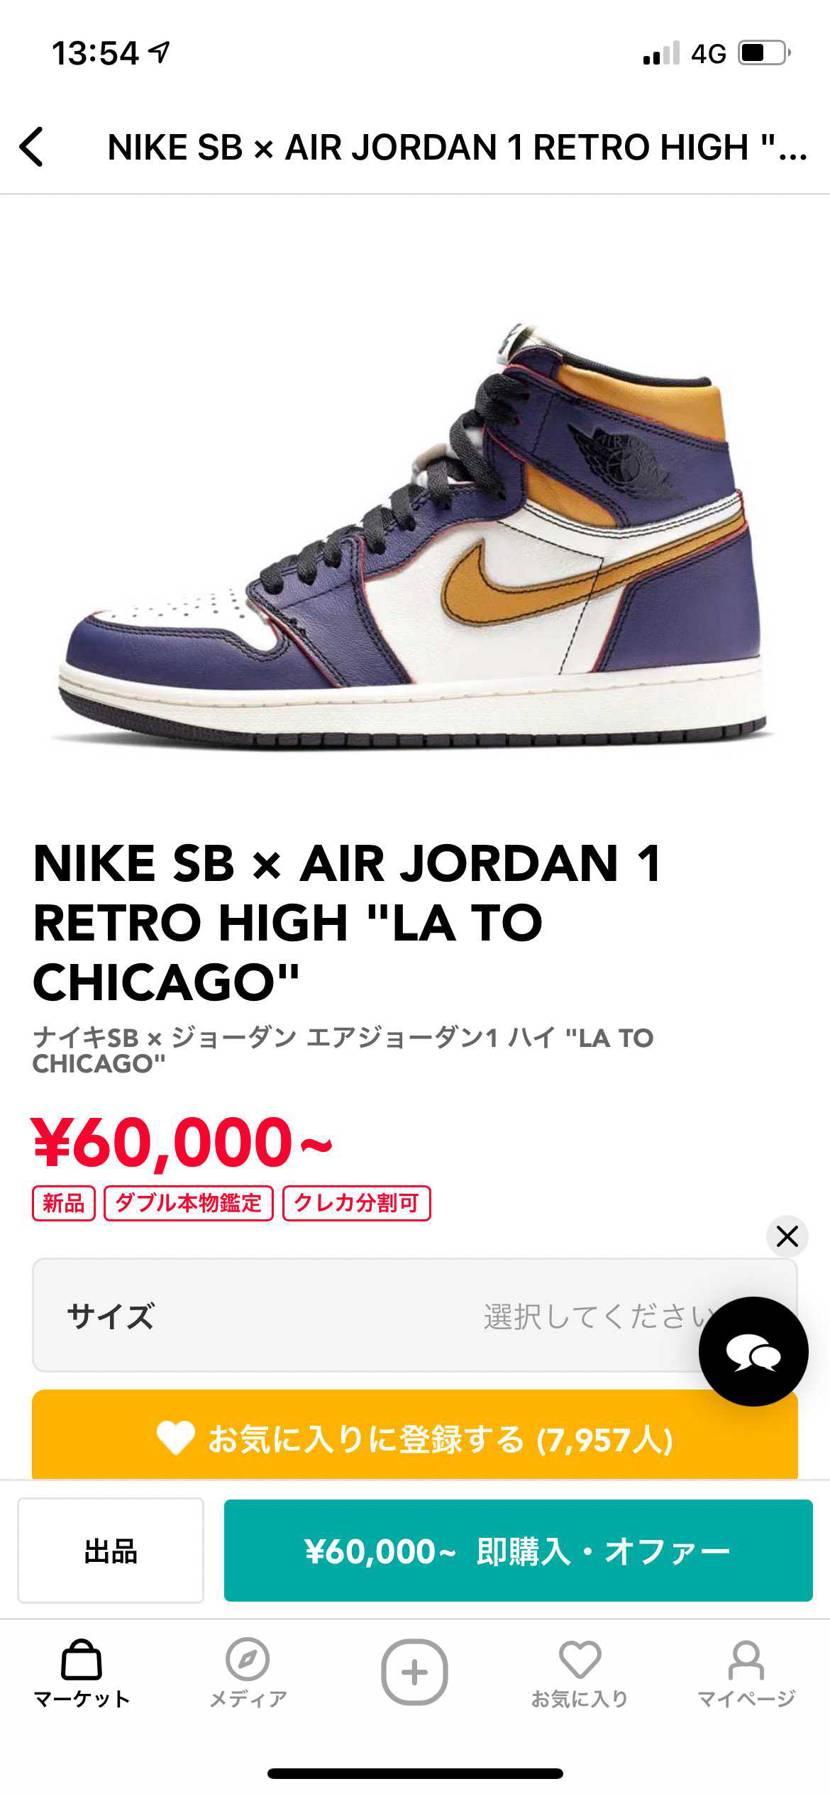 "NIKE SB × AIR JORDAN 1 RETRO HIGH ""LA TO"